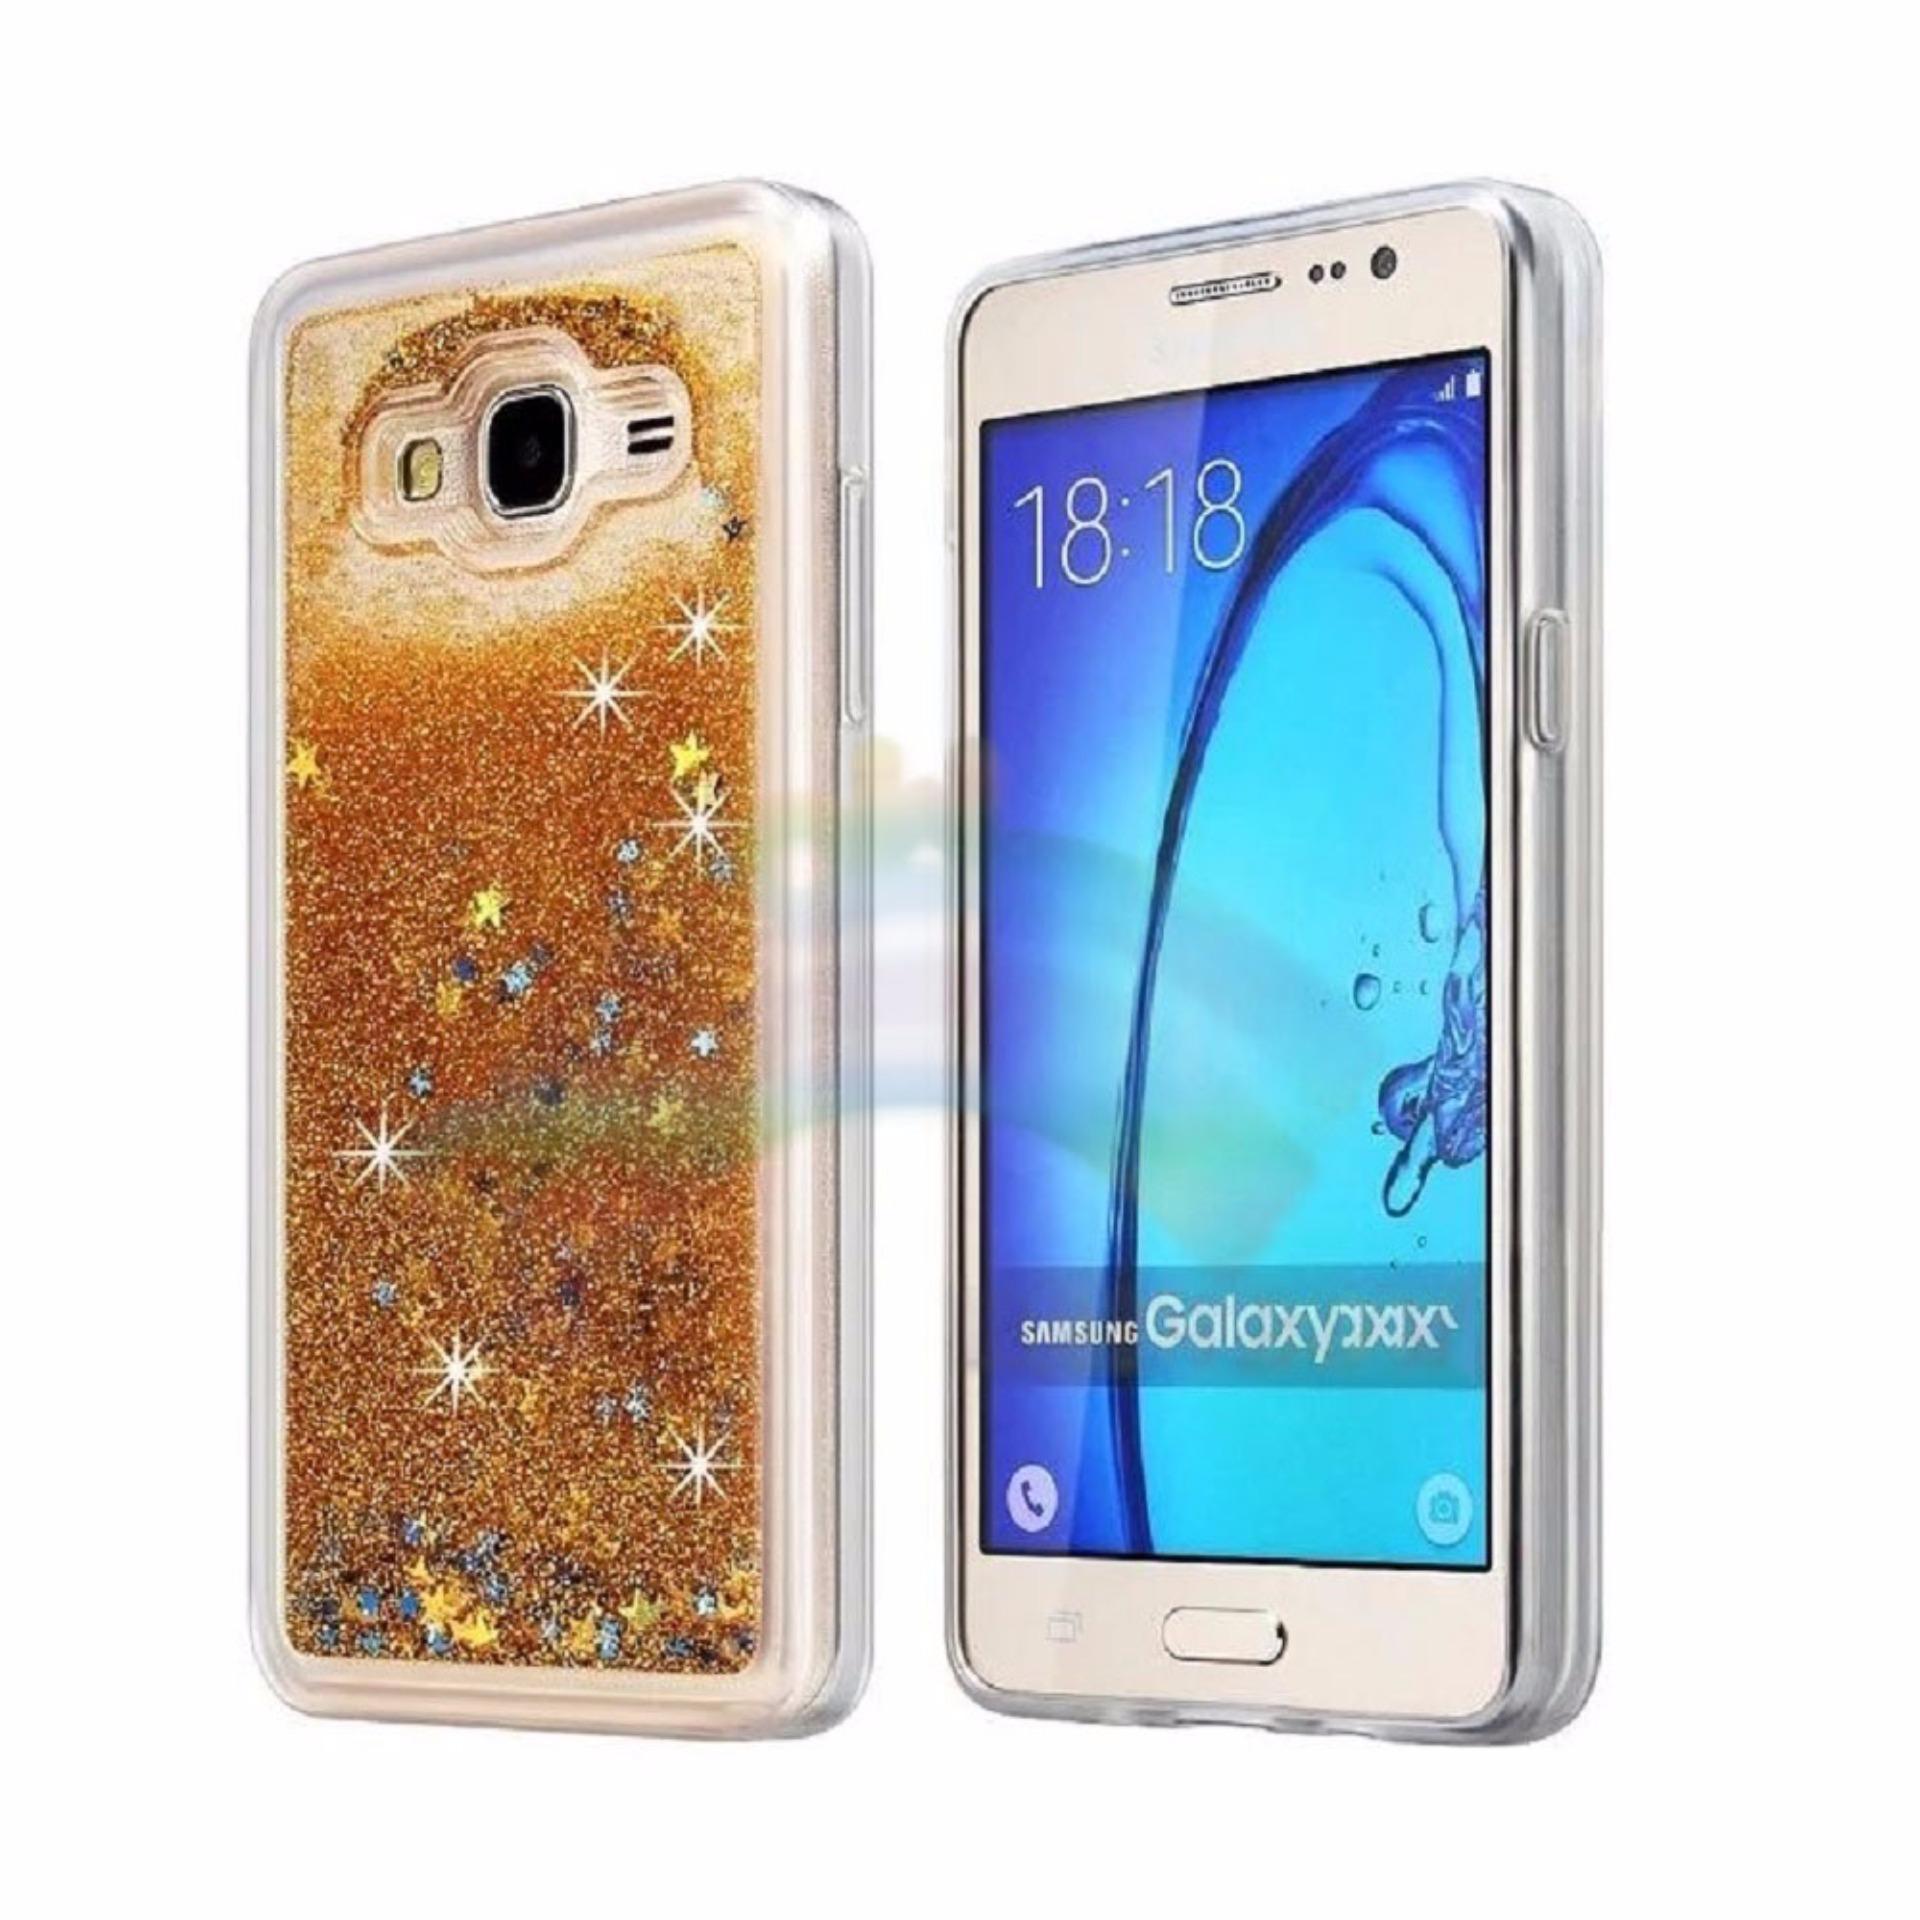 Rainbow Samsung Galaxy J1 Ace J110 Soft Case Water Glitter GlowingStar TPU Silikon